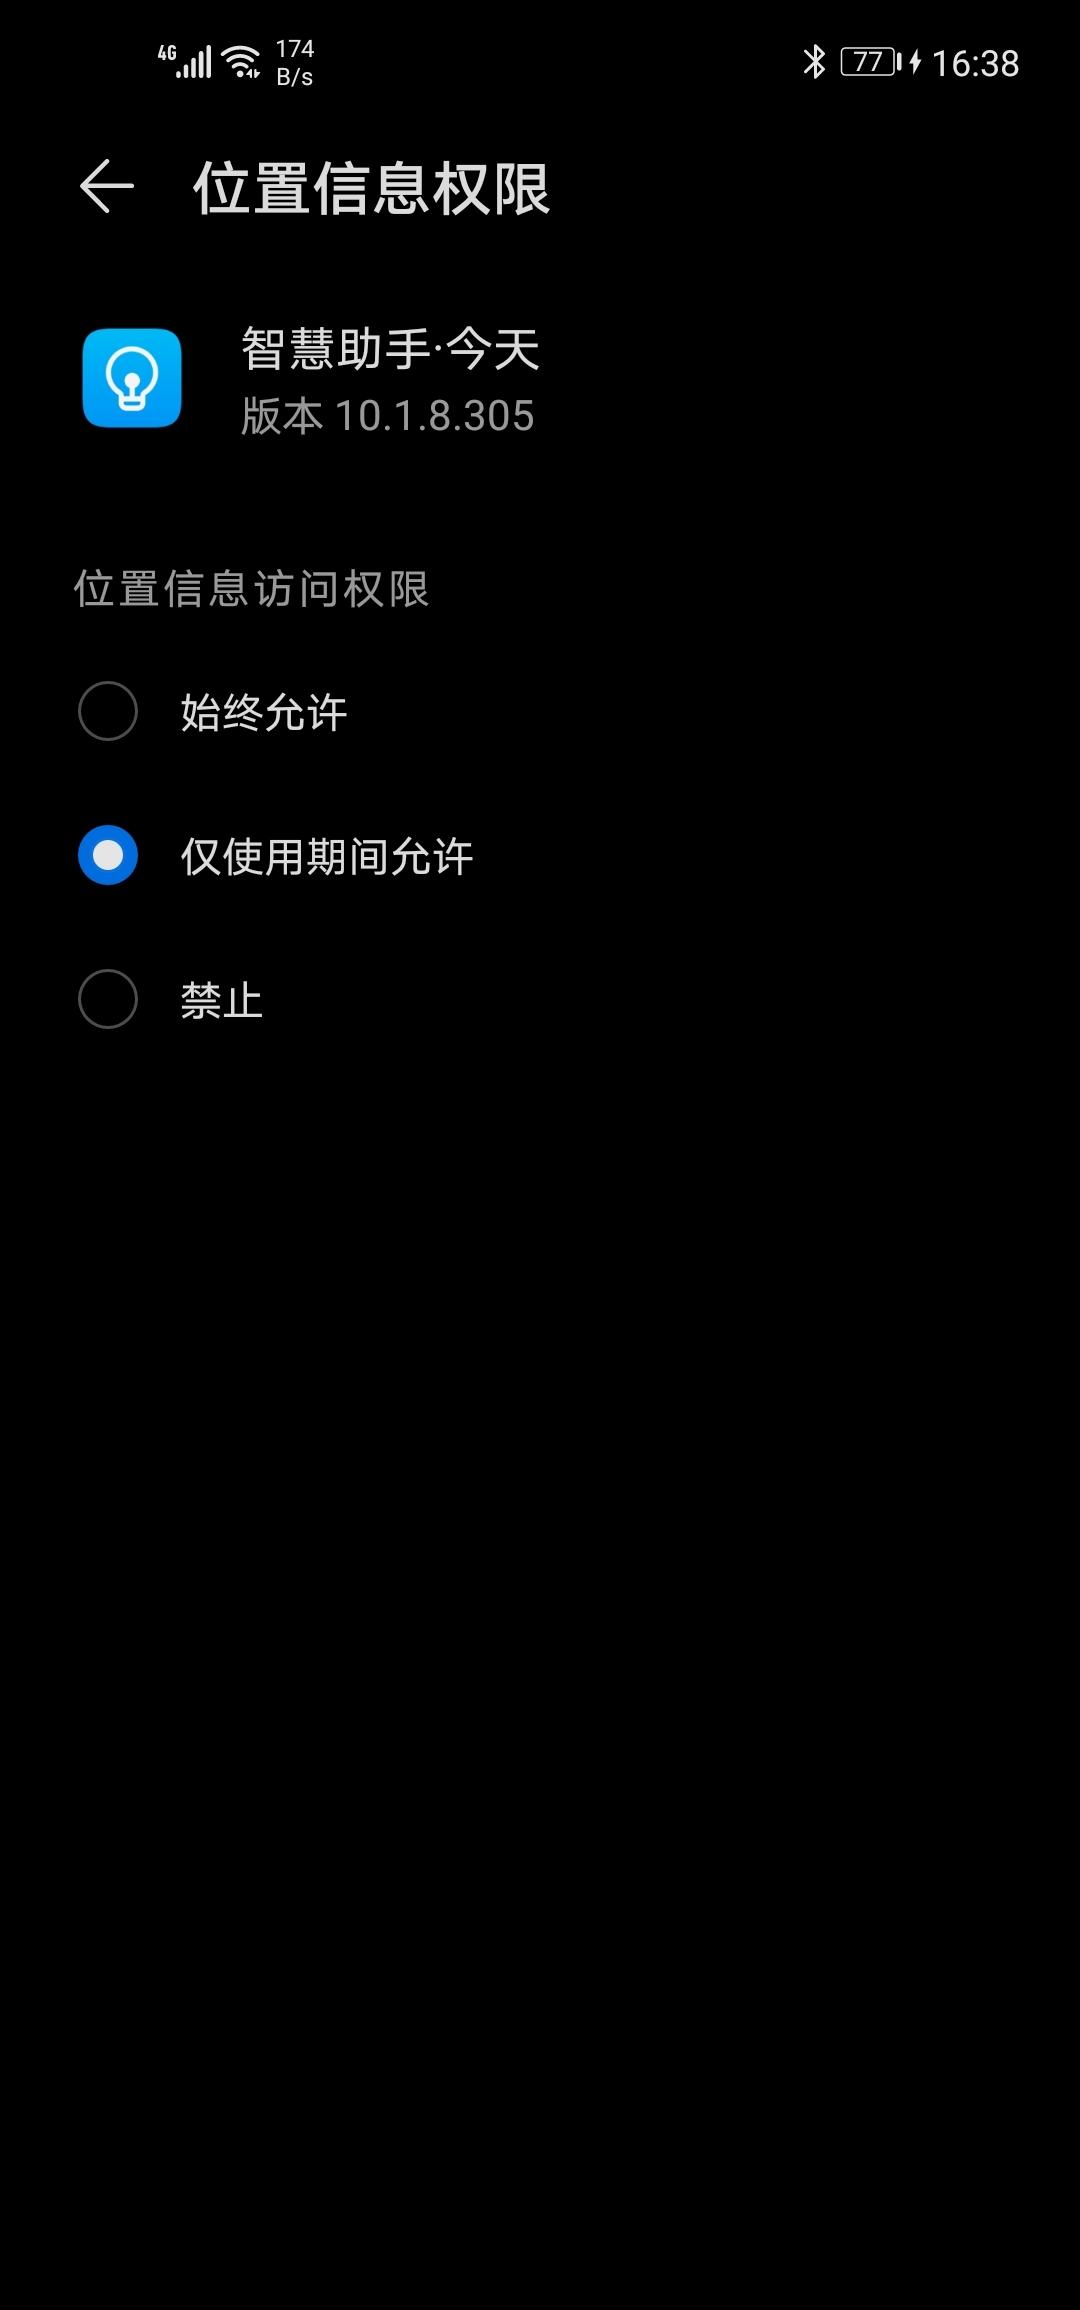 Screenshot_20200517_163854_com.android.permissioncontroller.jpg